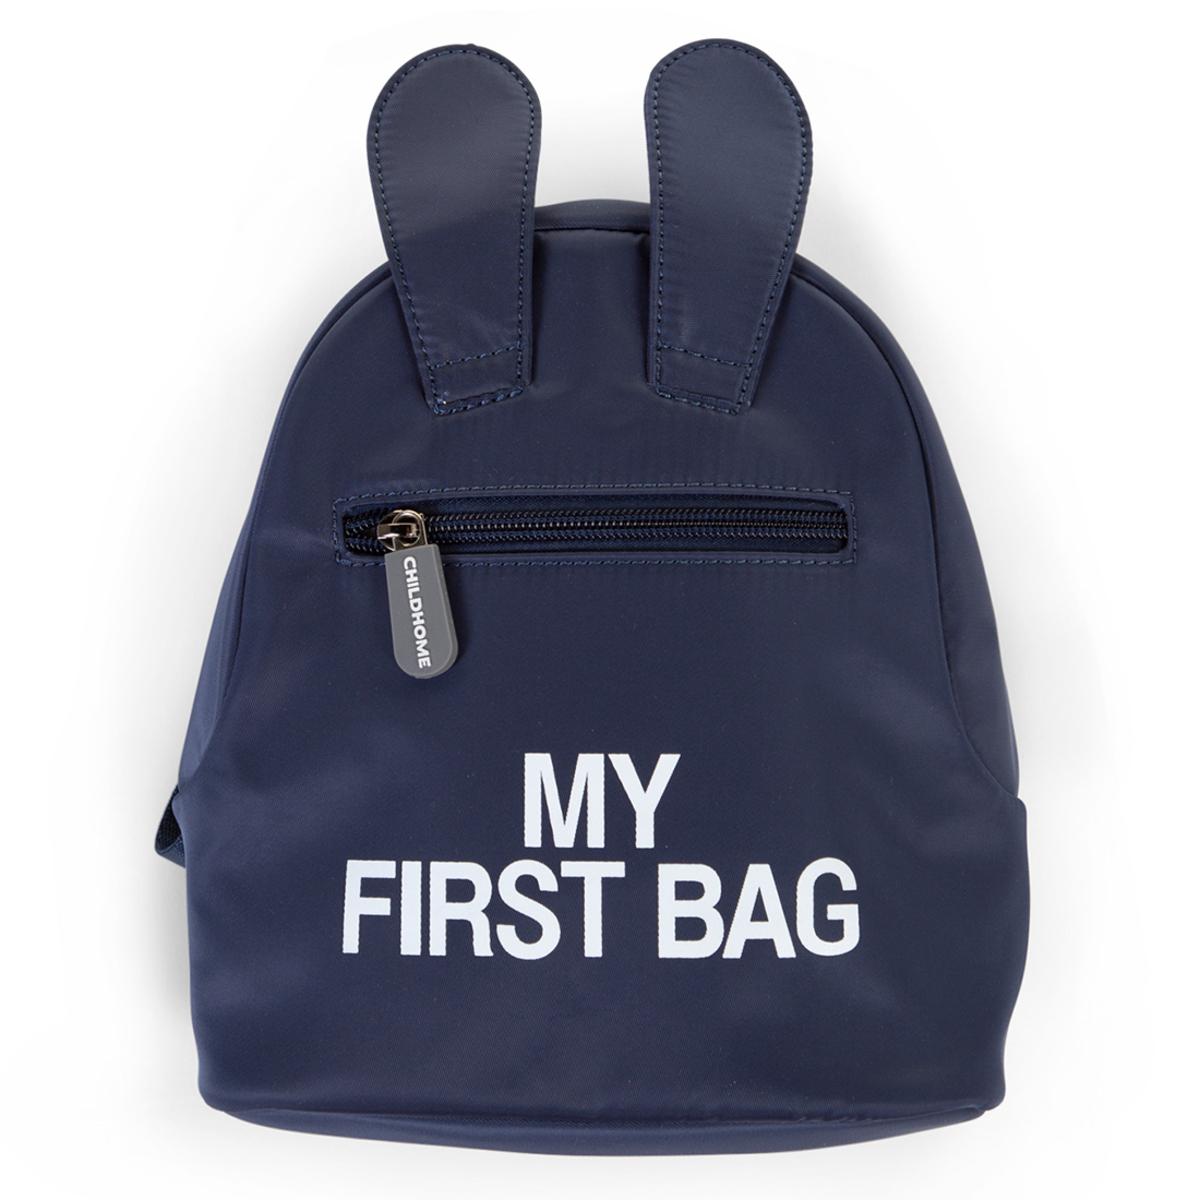 Bagagerie enfant Sac à Dos My First Bag - Bleu Sac à Dos My First Bag - Bleu